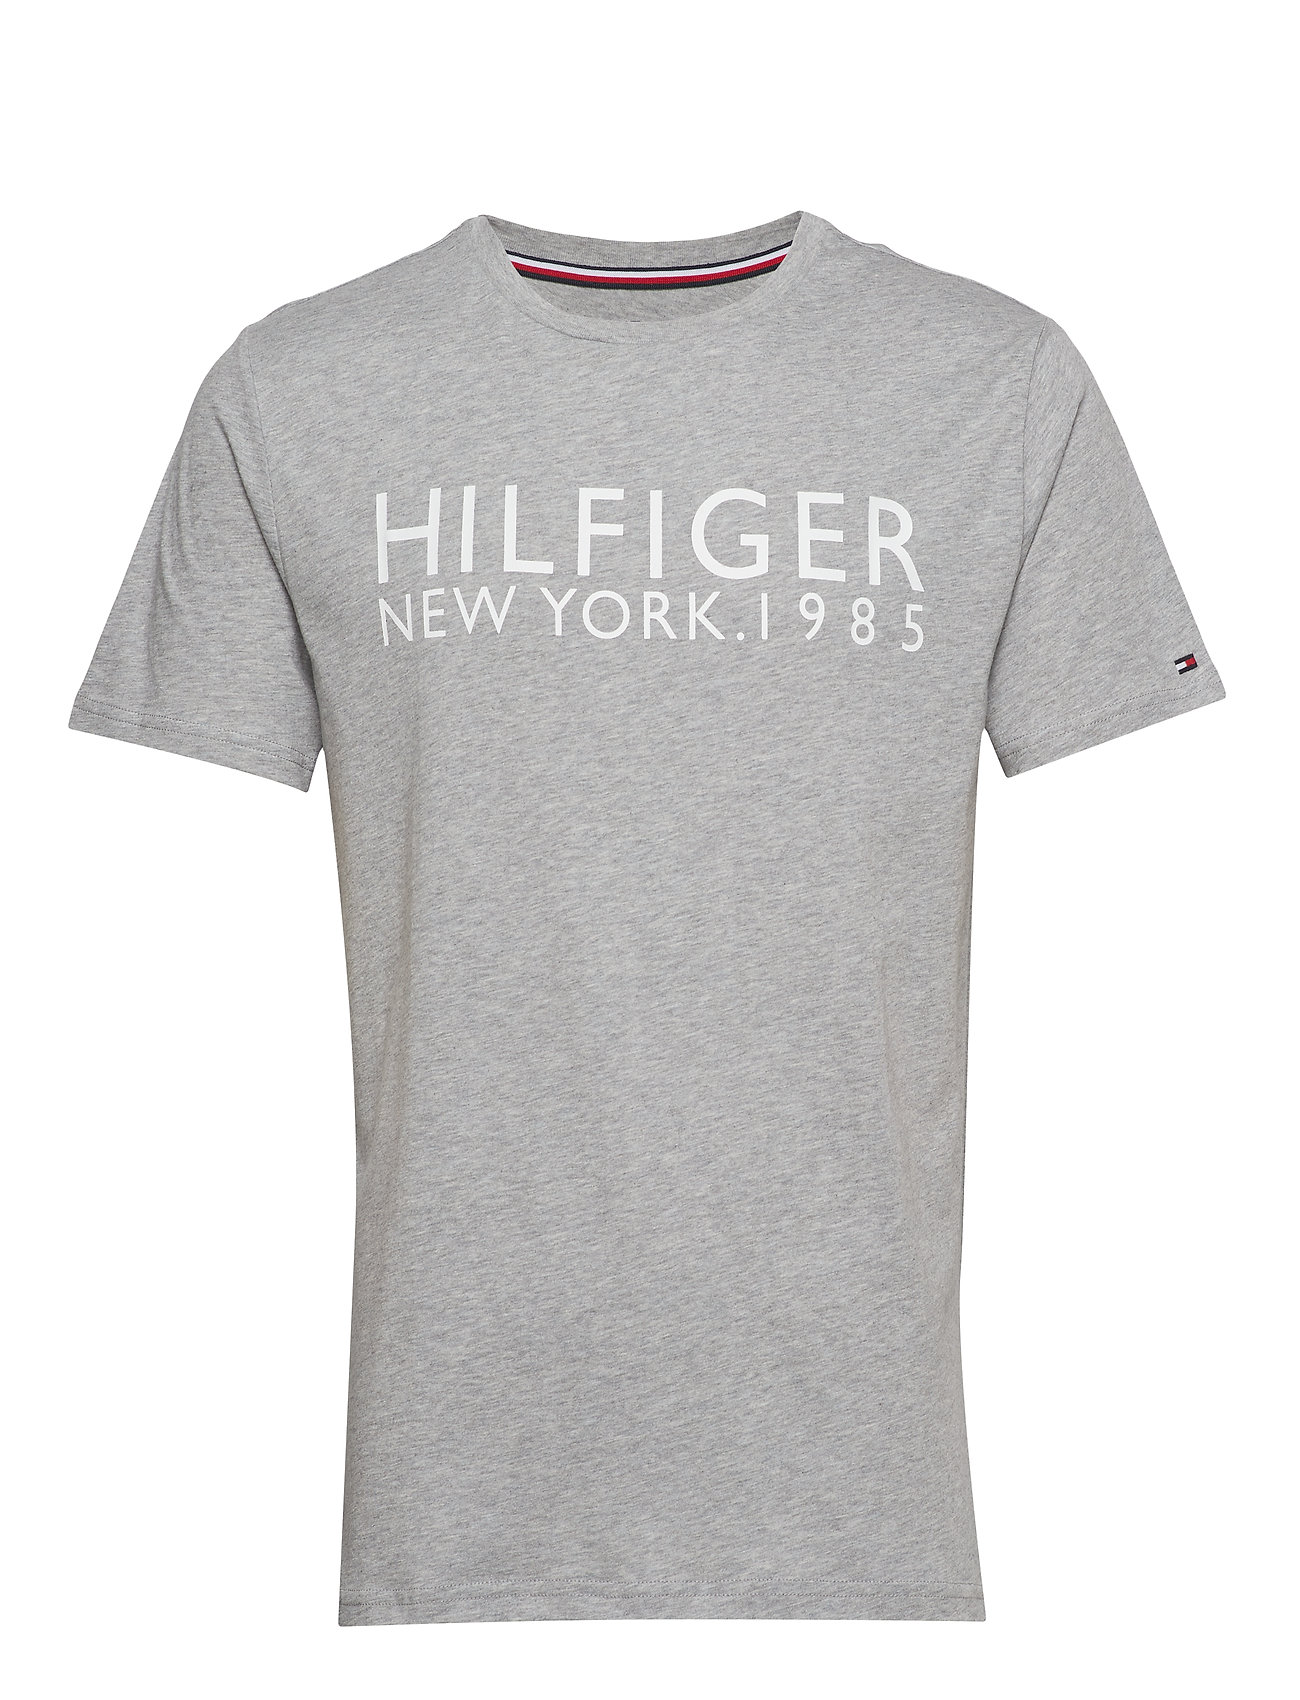 Tommy Hilfiger CN SS TEE LOGO - GREY HEATHER